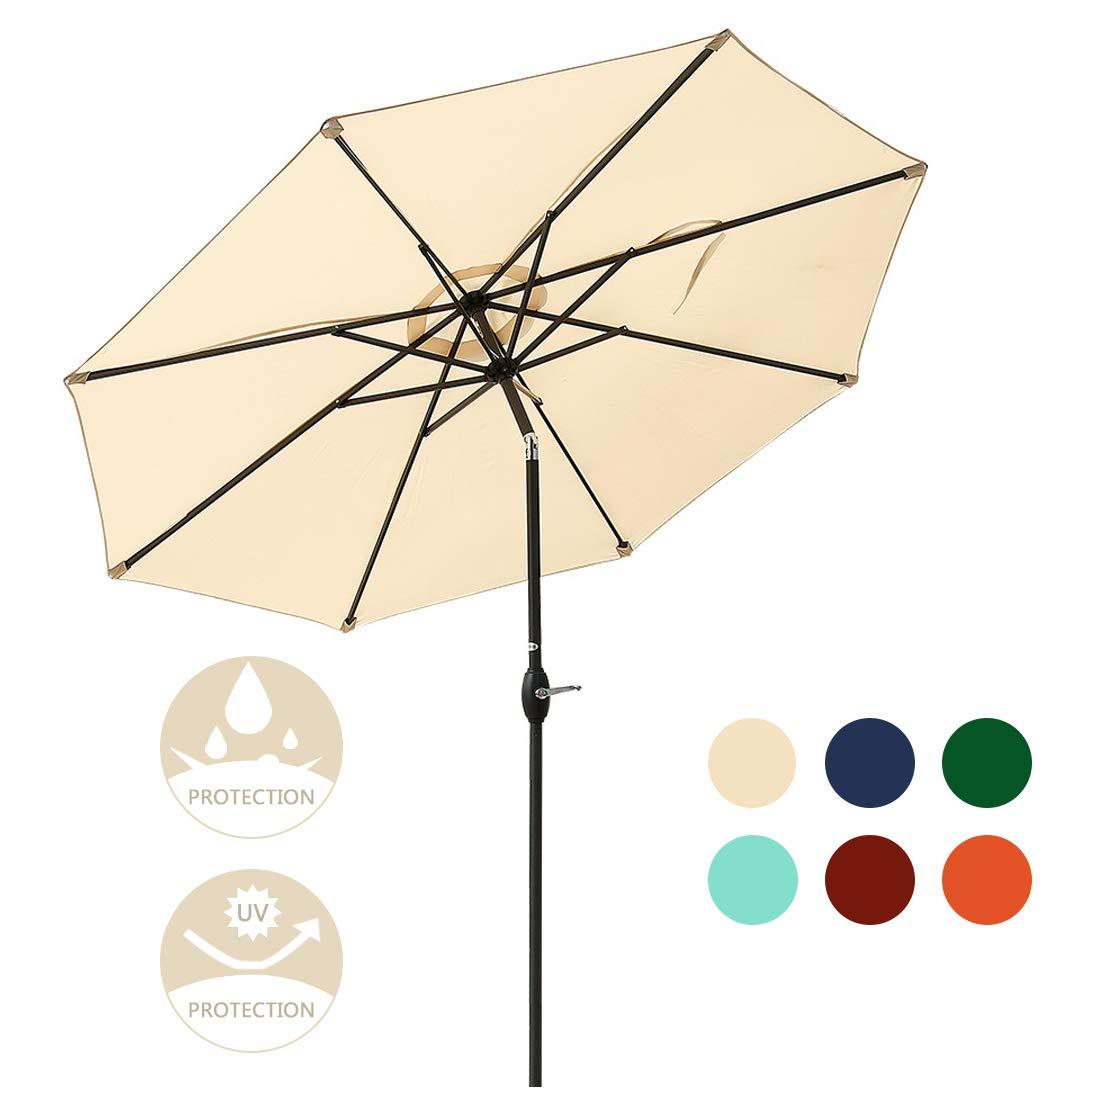 JEAREY Patio Umbrella 9' Outdoor Table Aluminum Market Umbrella with Push Button Tilt and Crank,8 Ribs with Fiberglass Rib Tips(Beige)